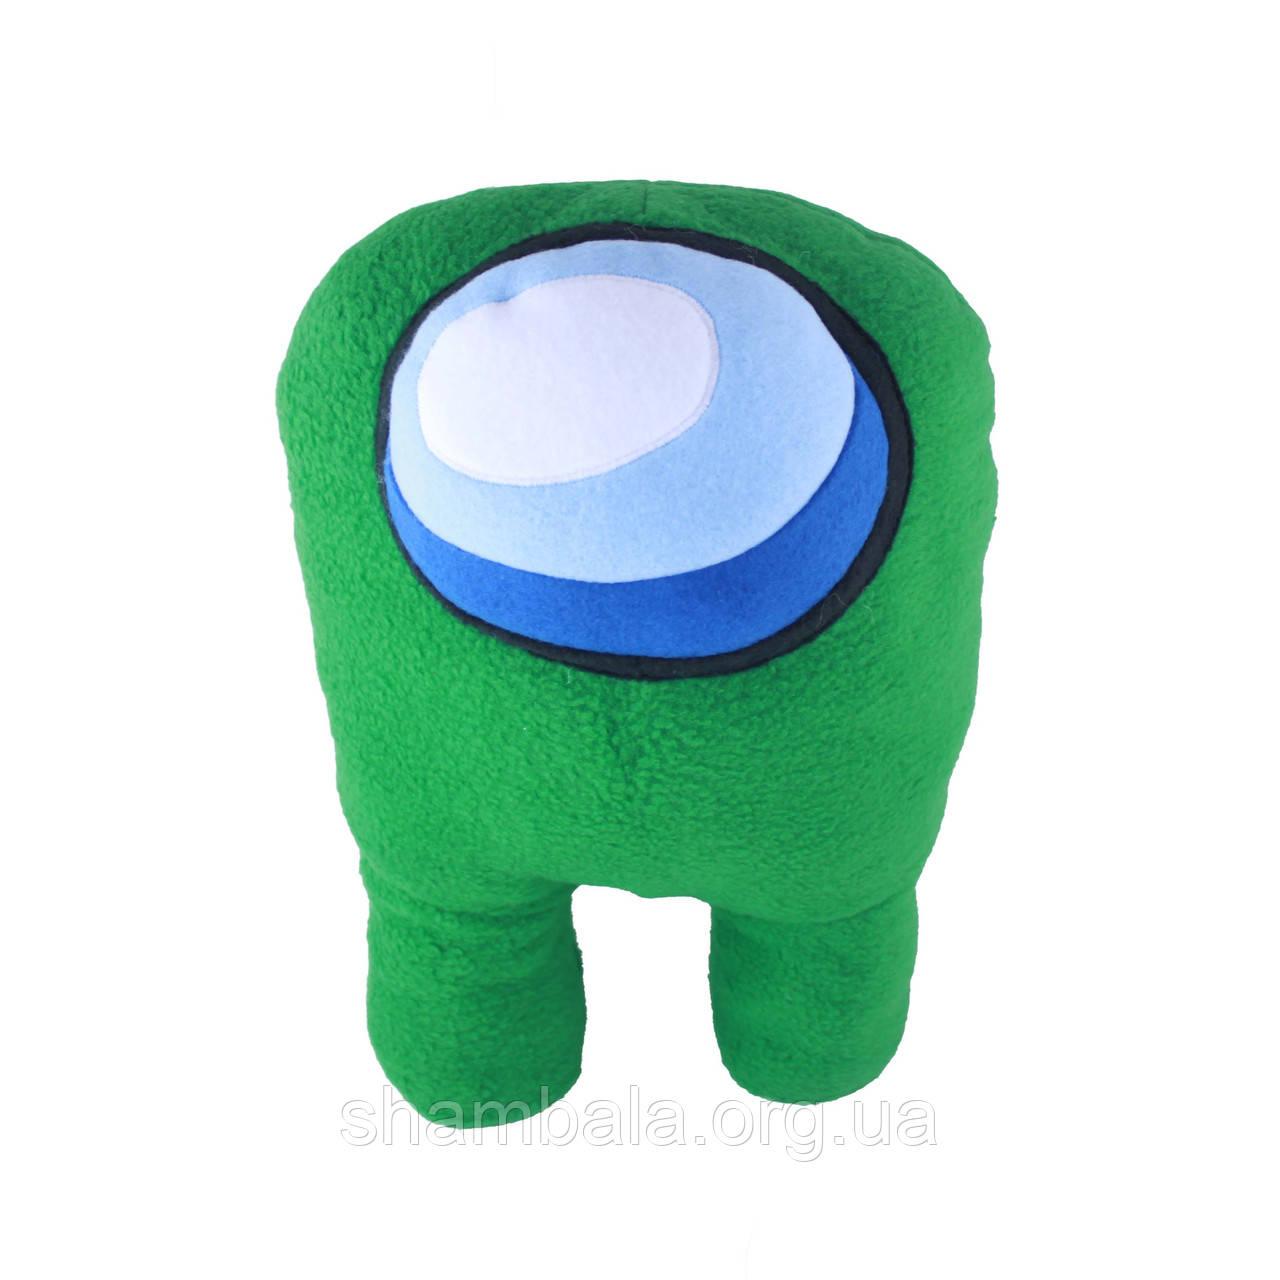 М'яка іграшка Амонг Ас, Космонавт Among Us Зелений (096032)